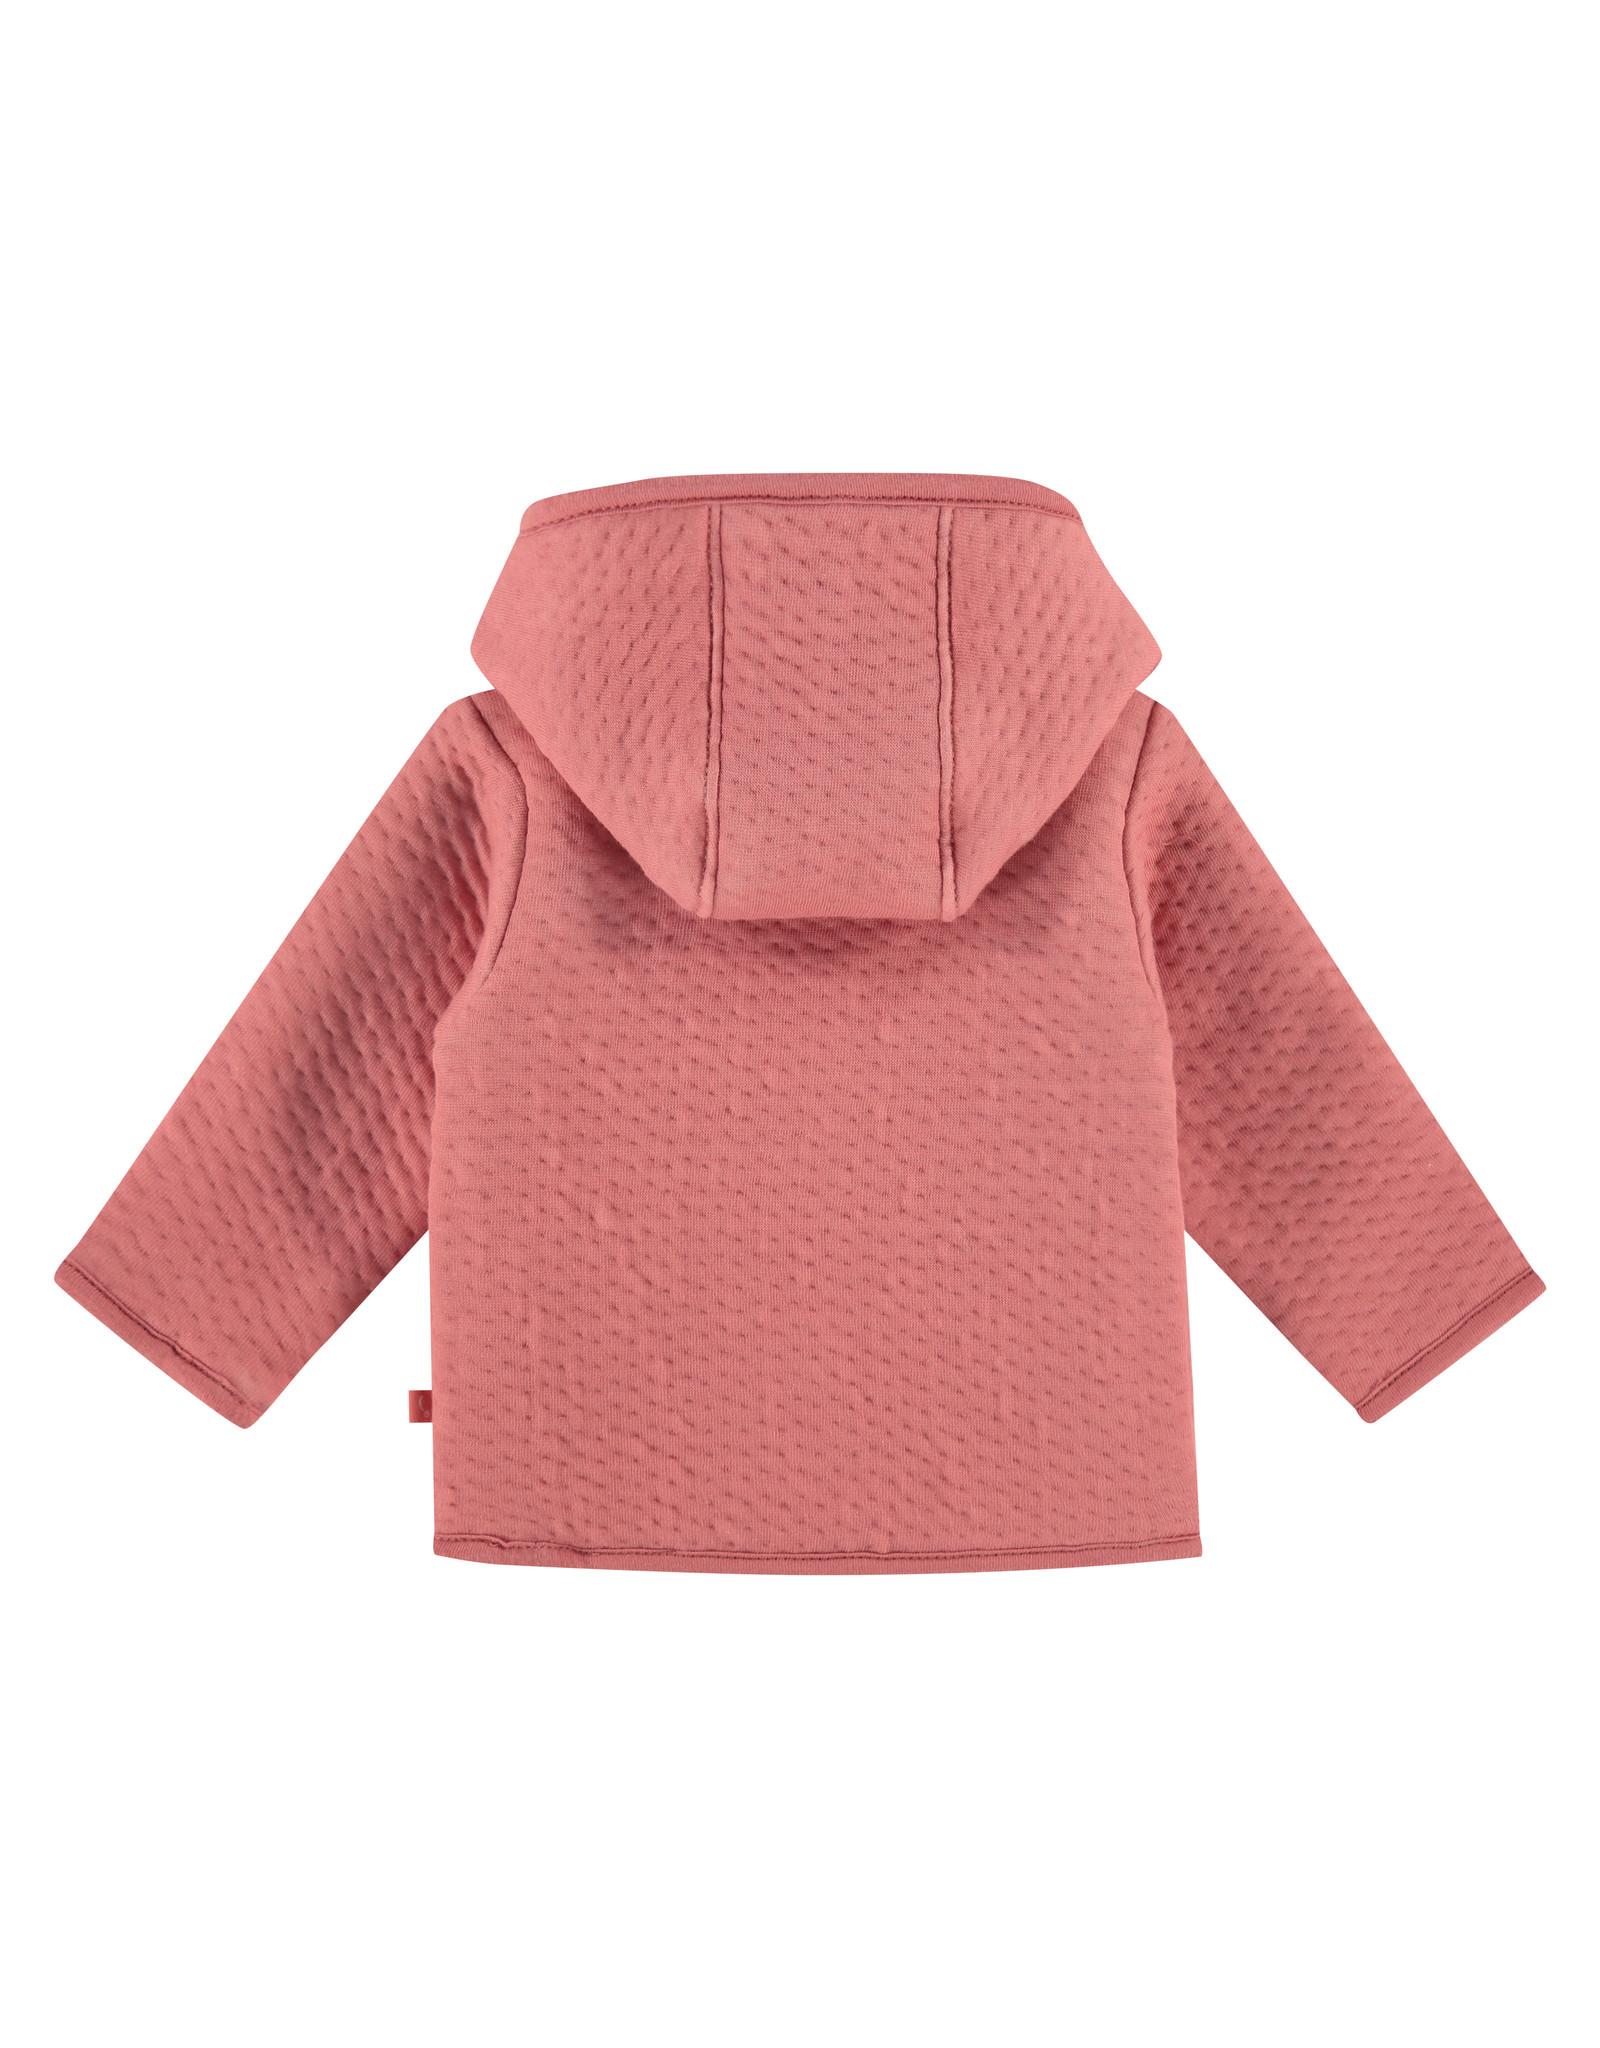 Babyface baby girls jacket, rusty pink